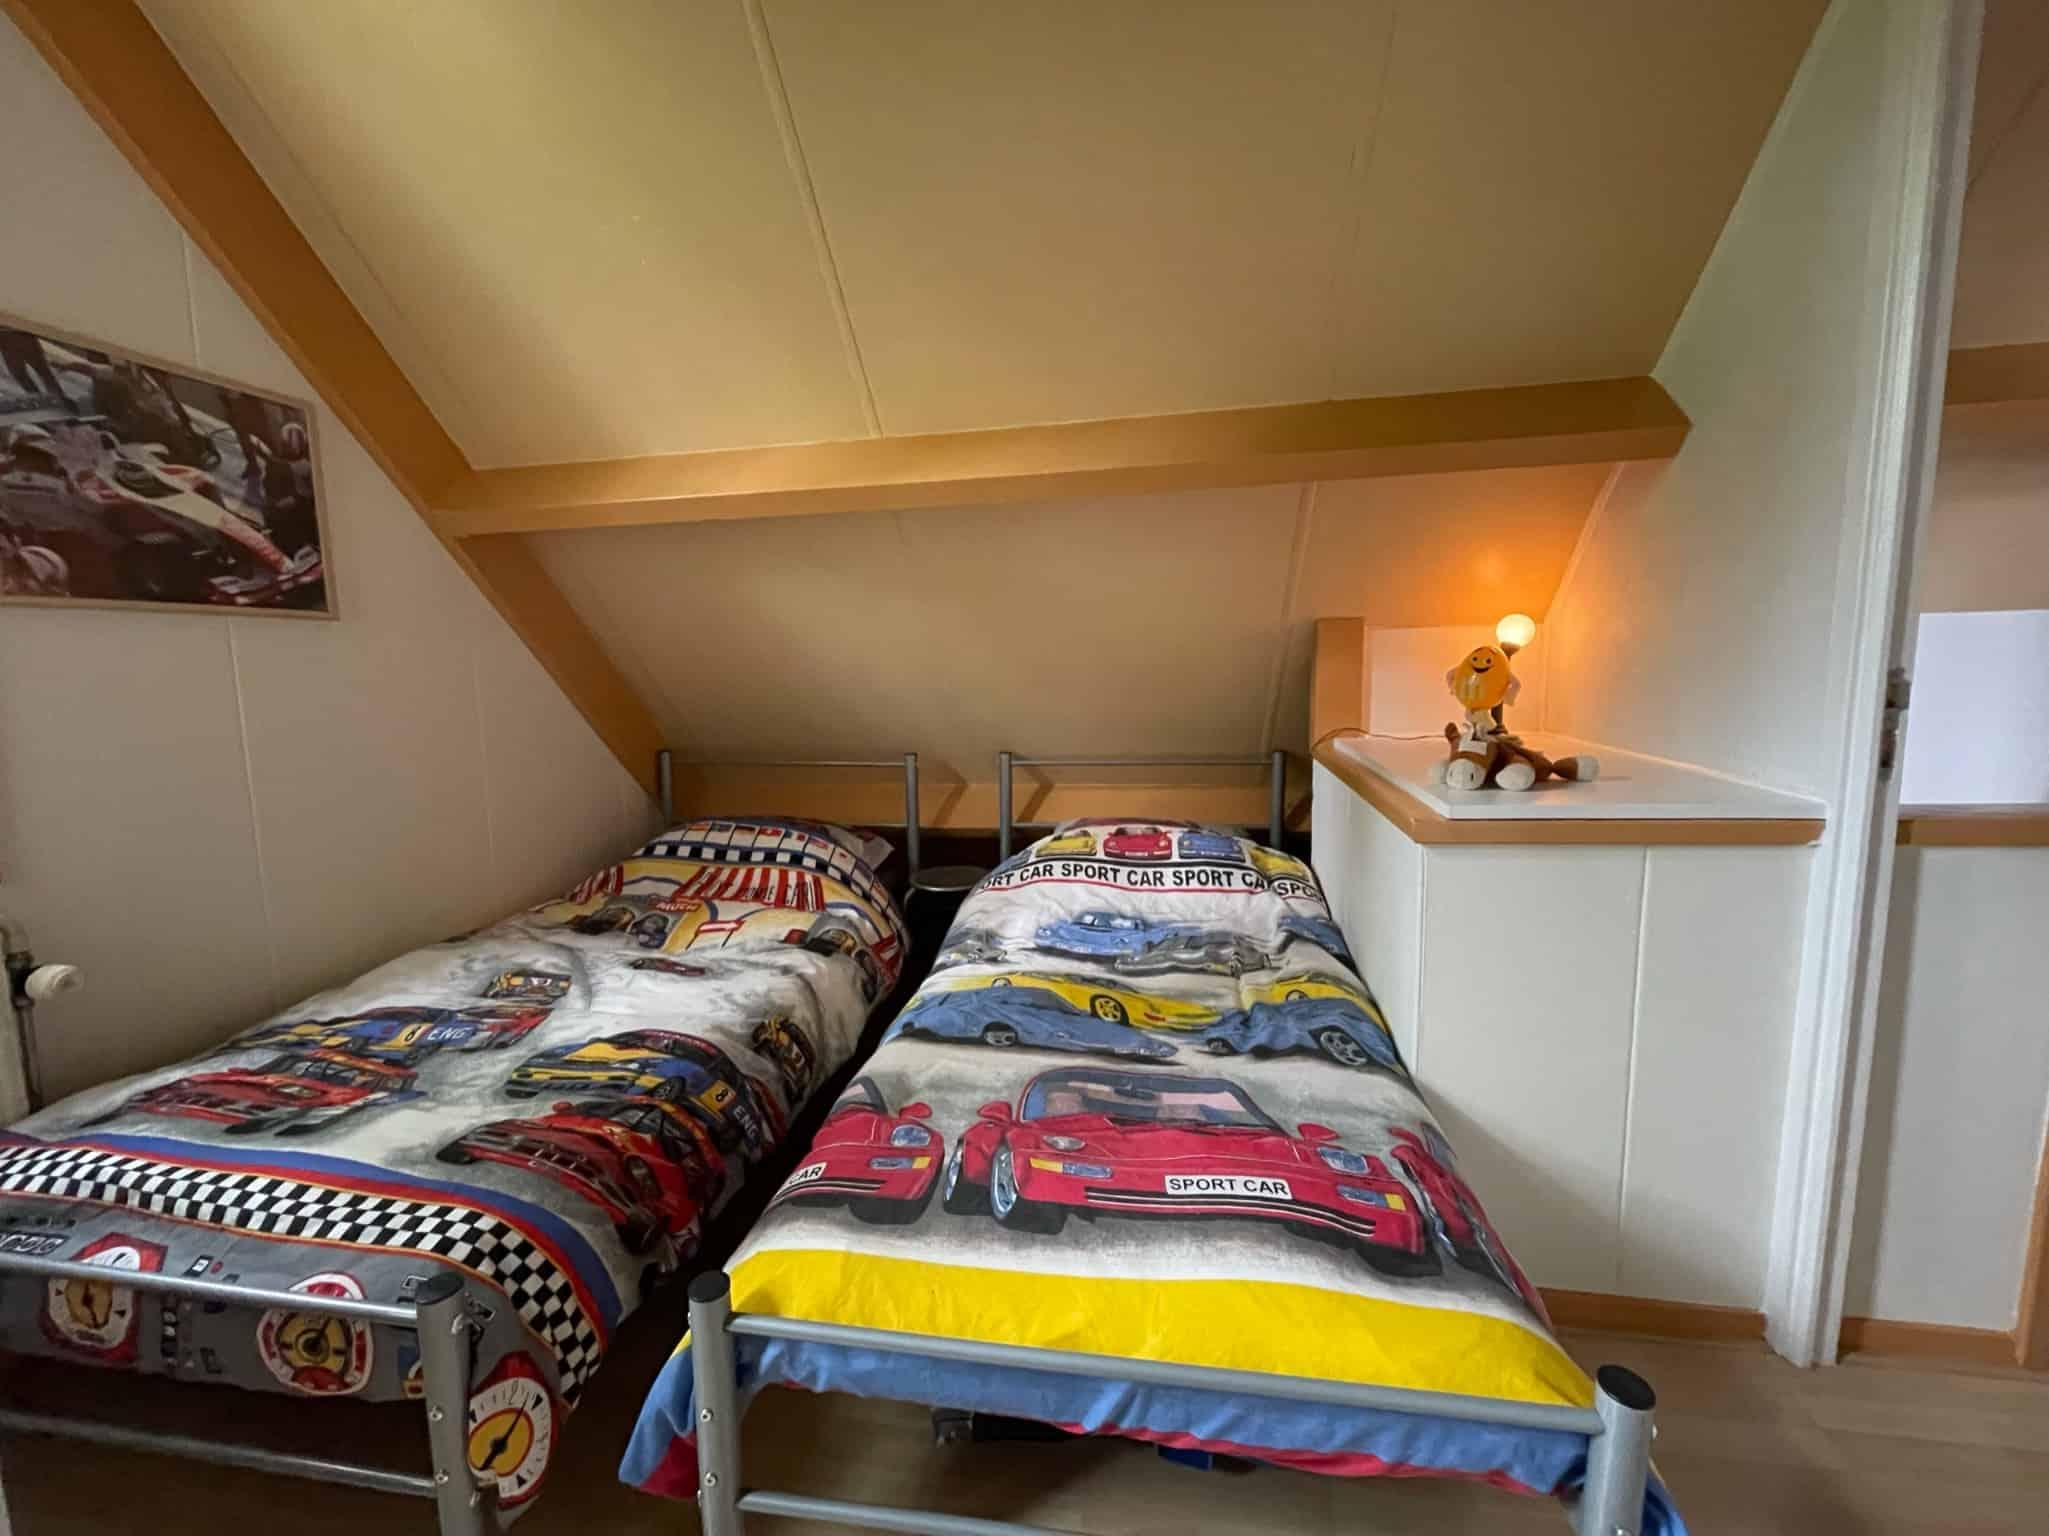 2  losse bedden